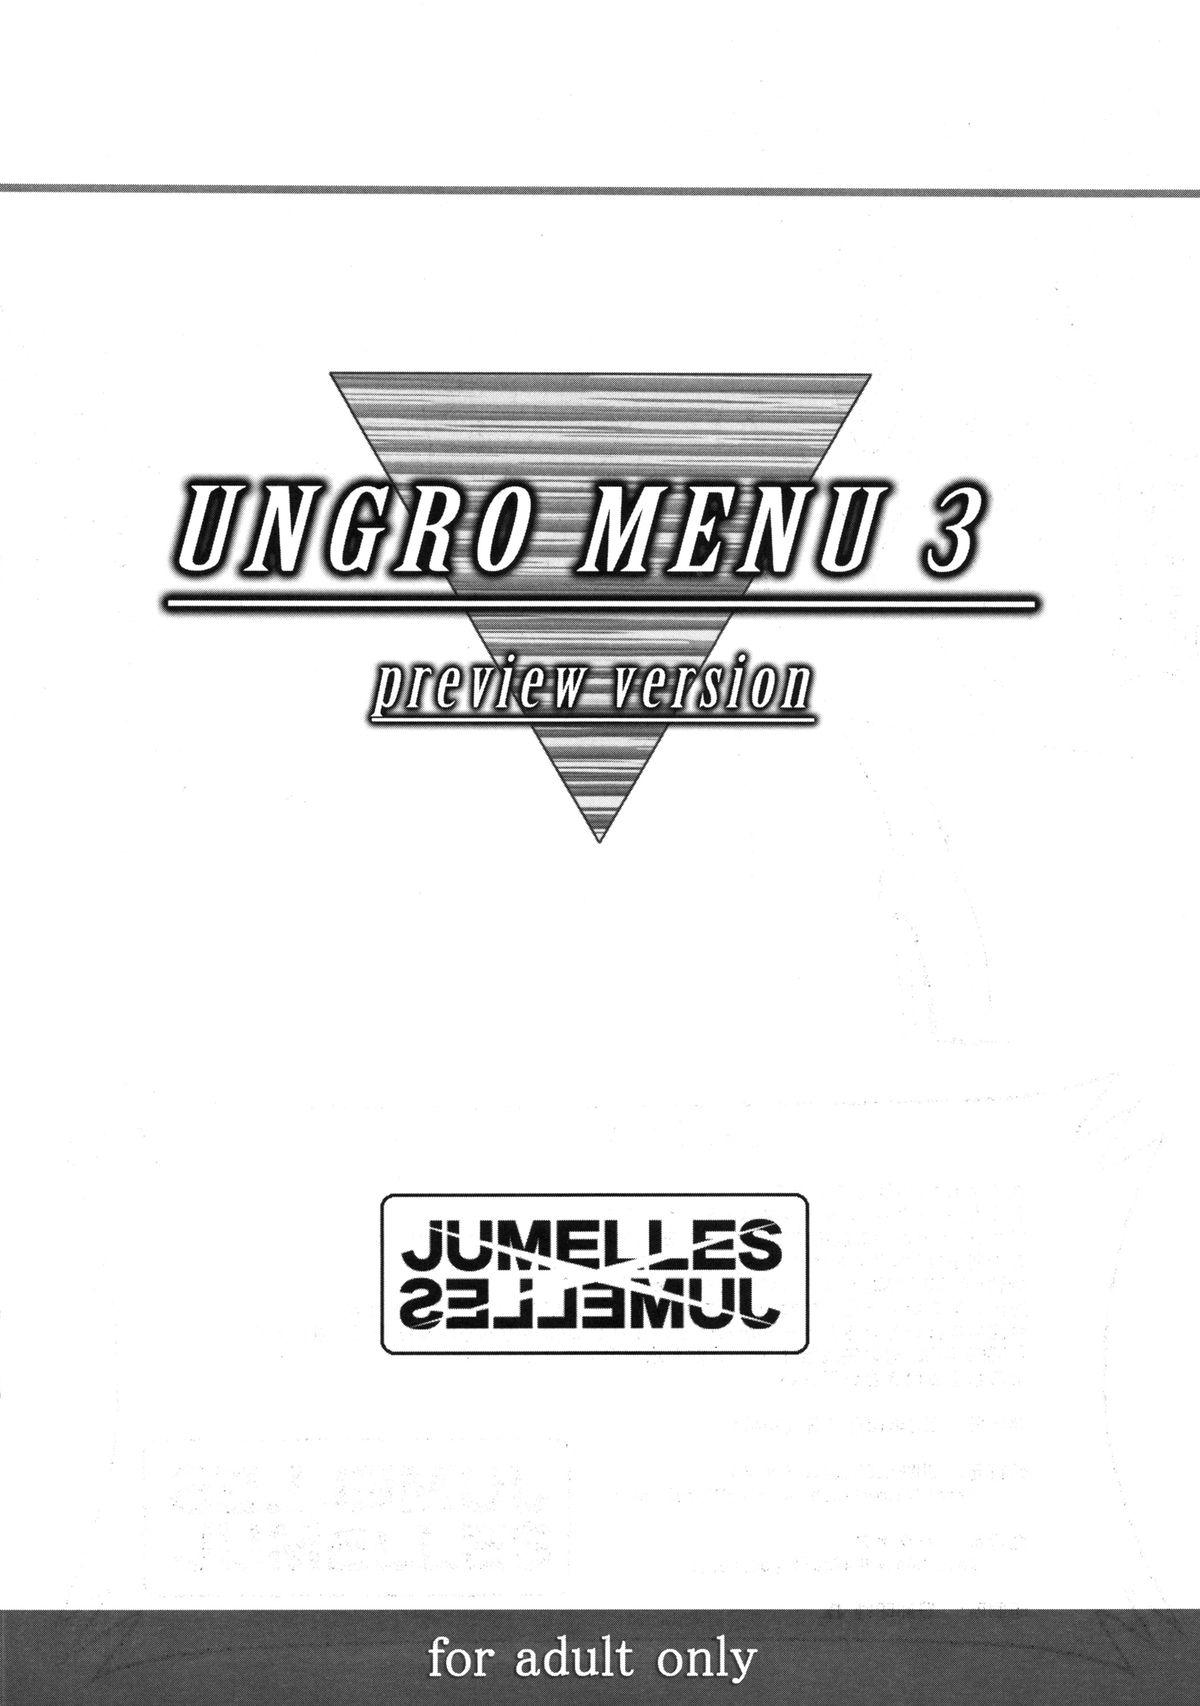 UNGRO MENU 3 preview version 15